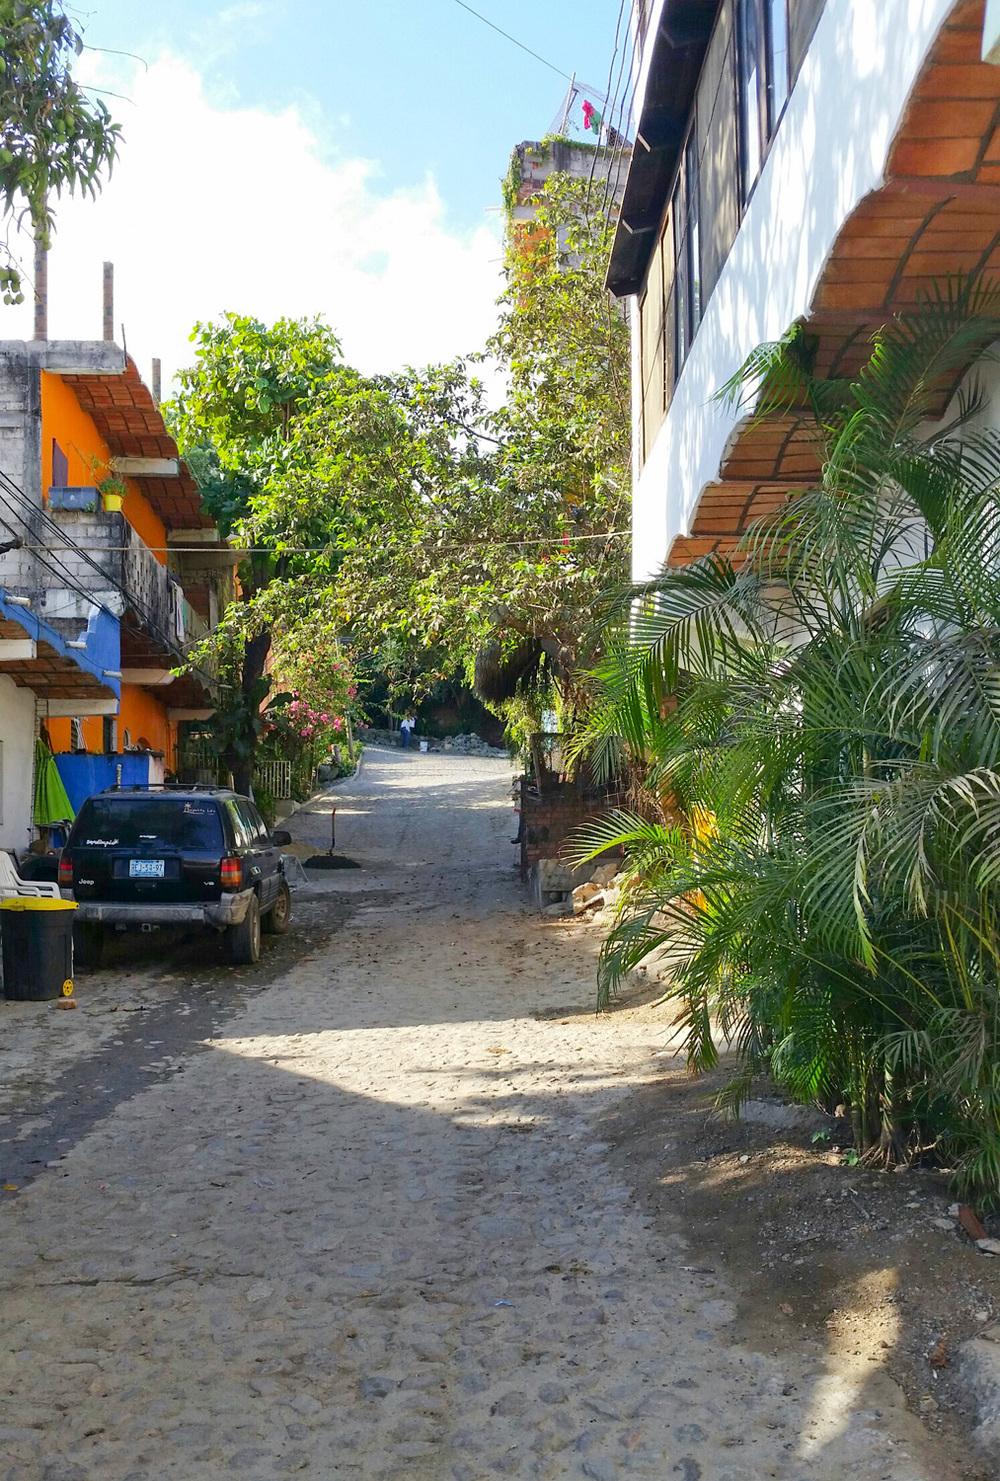 046-Sayulita-side-street.jpg